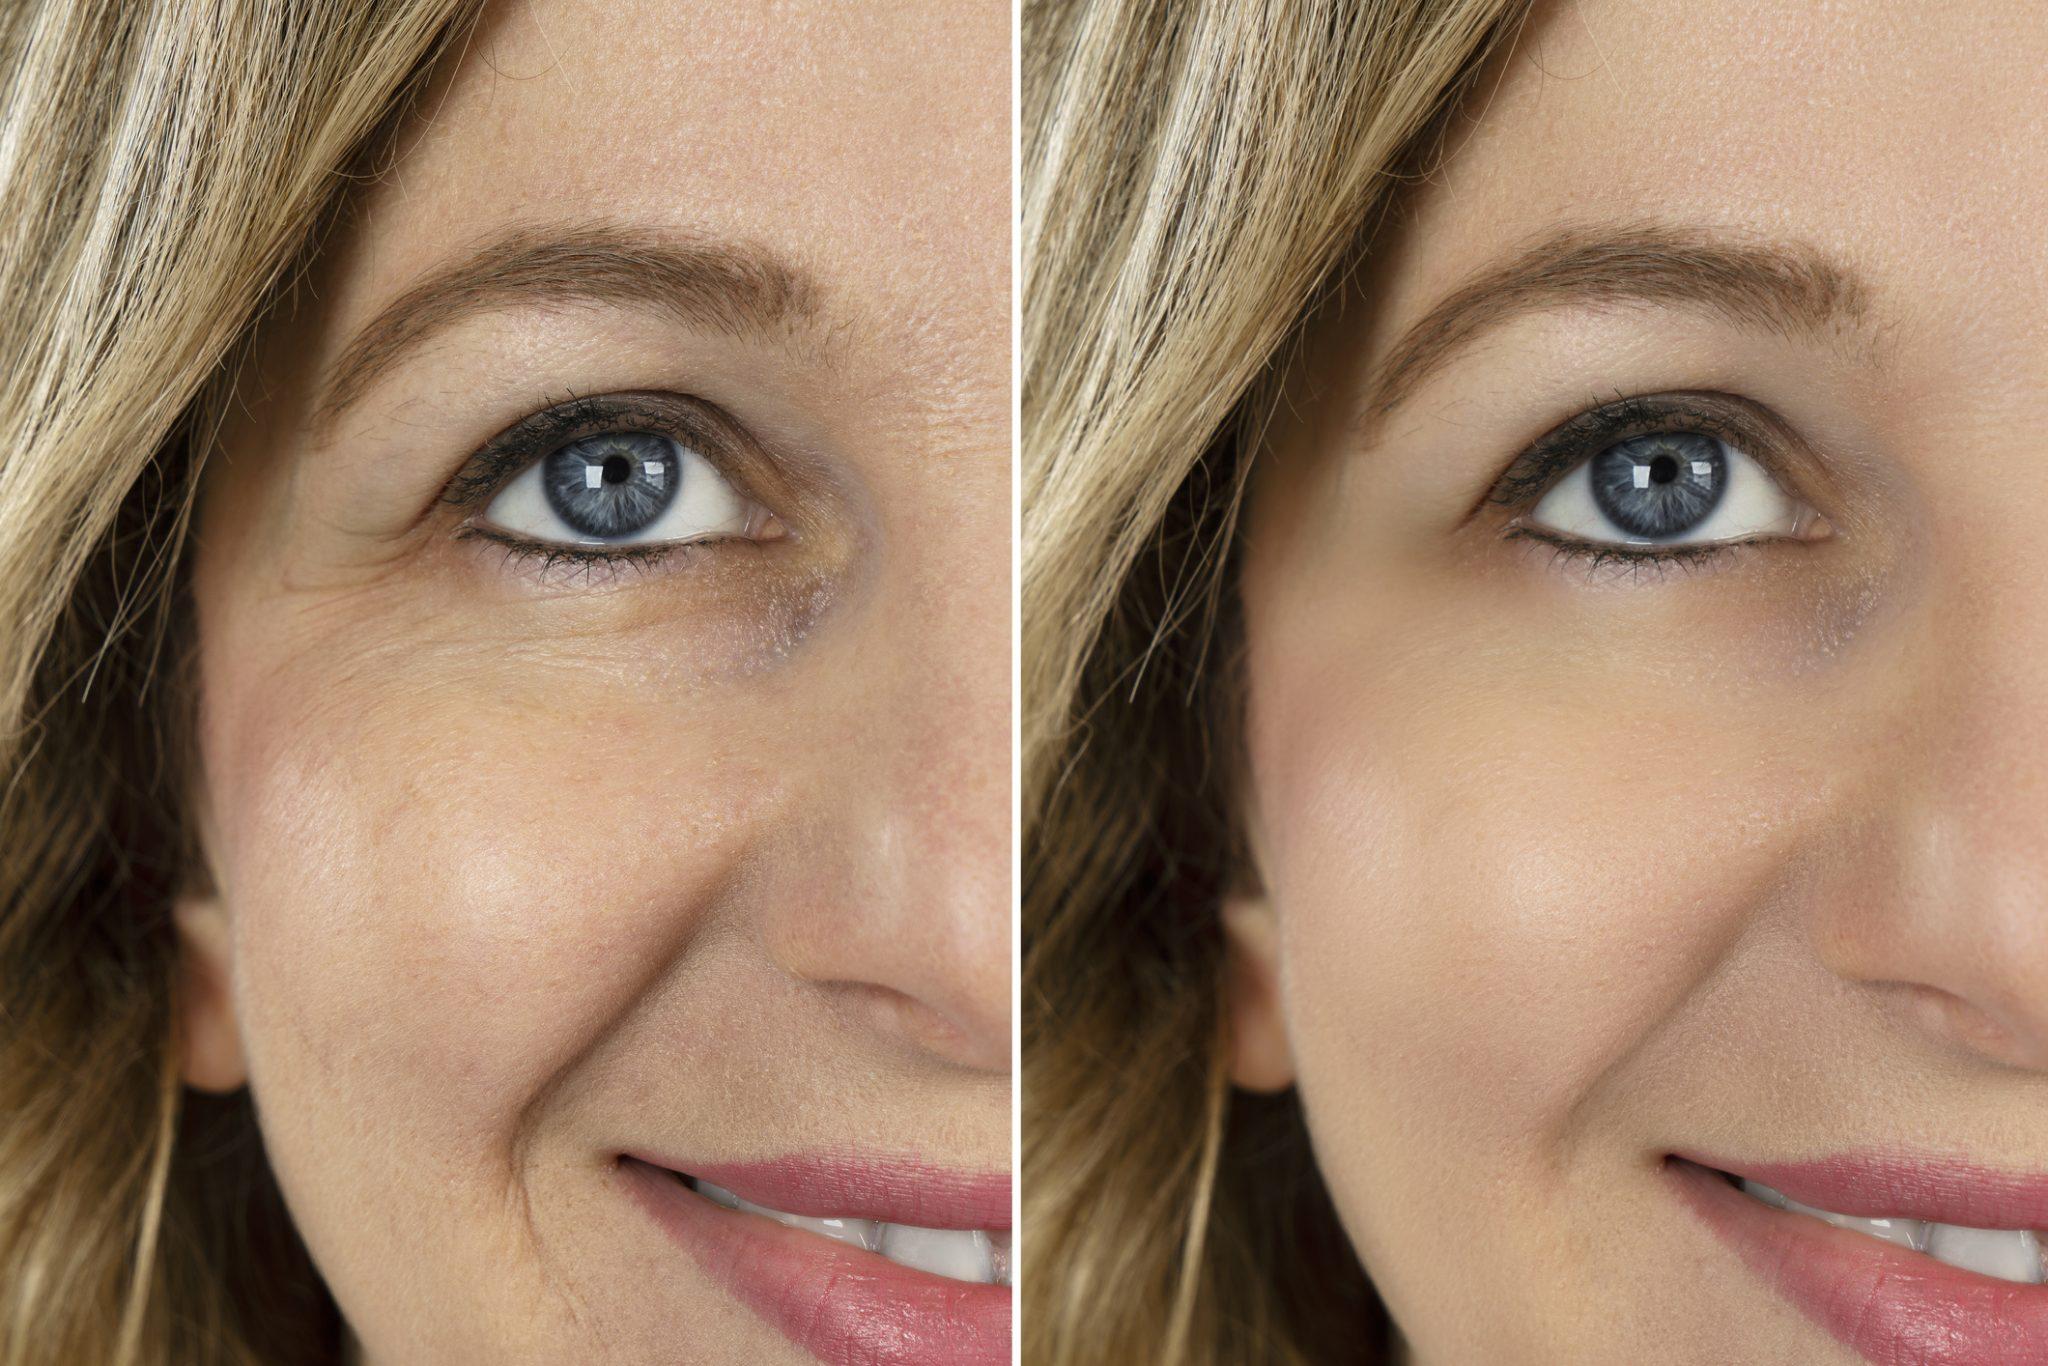 older women Botox areas